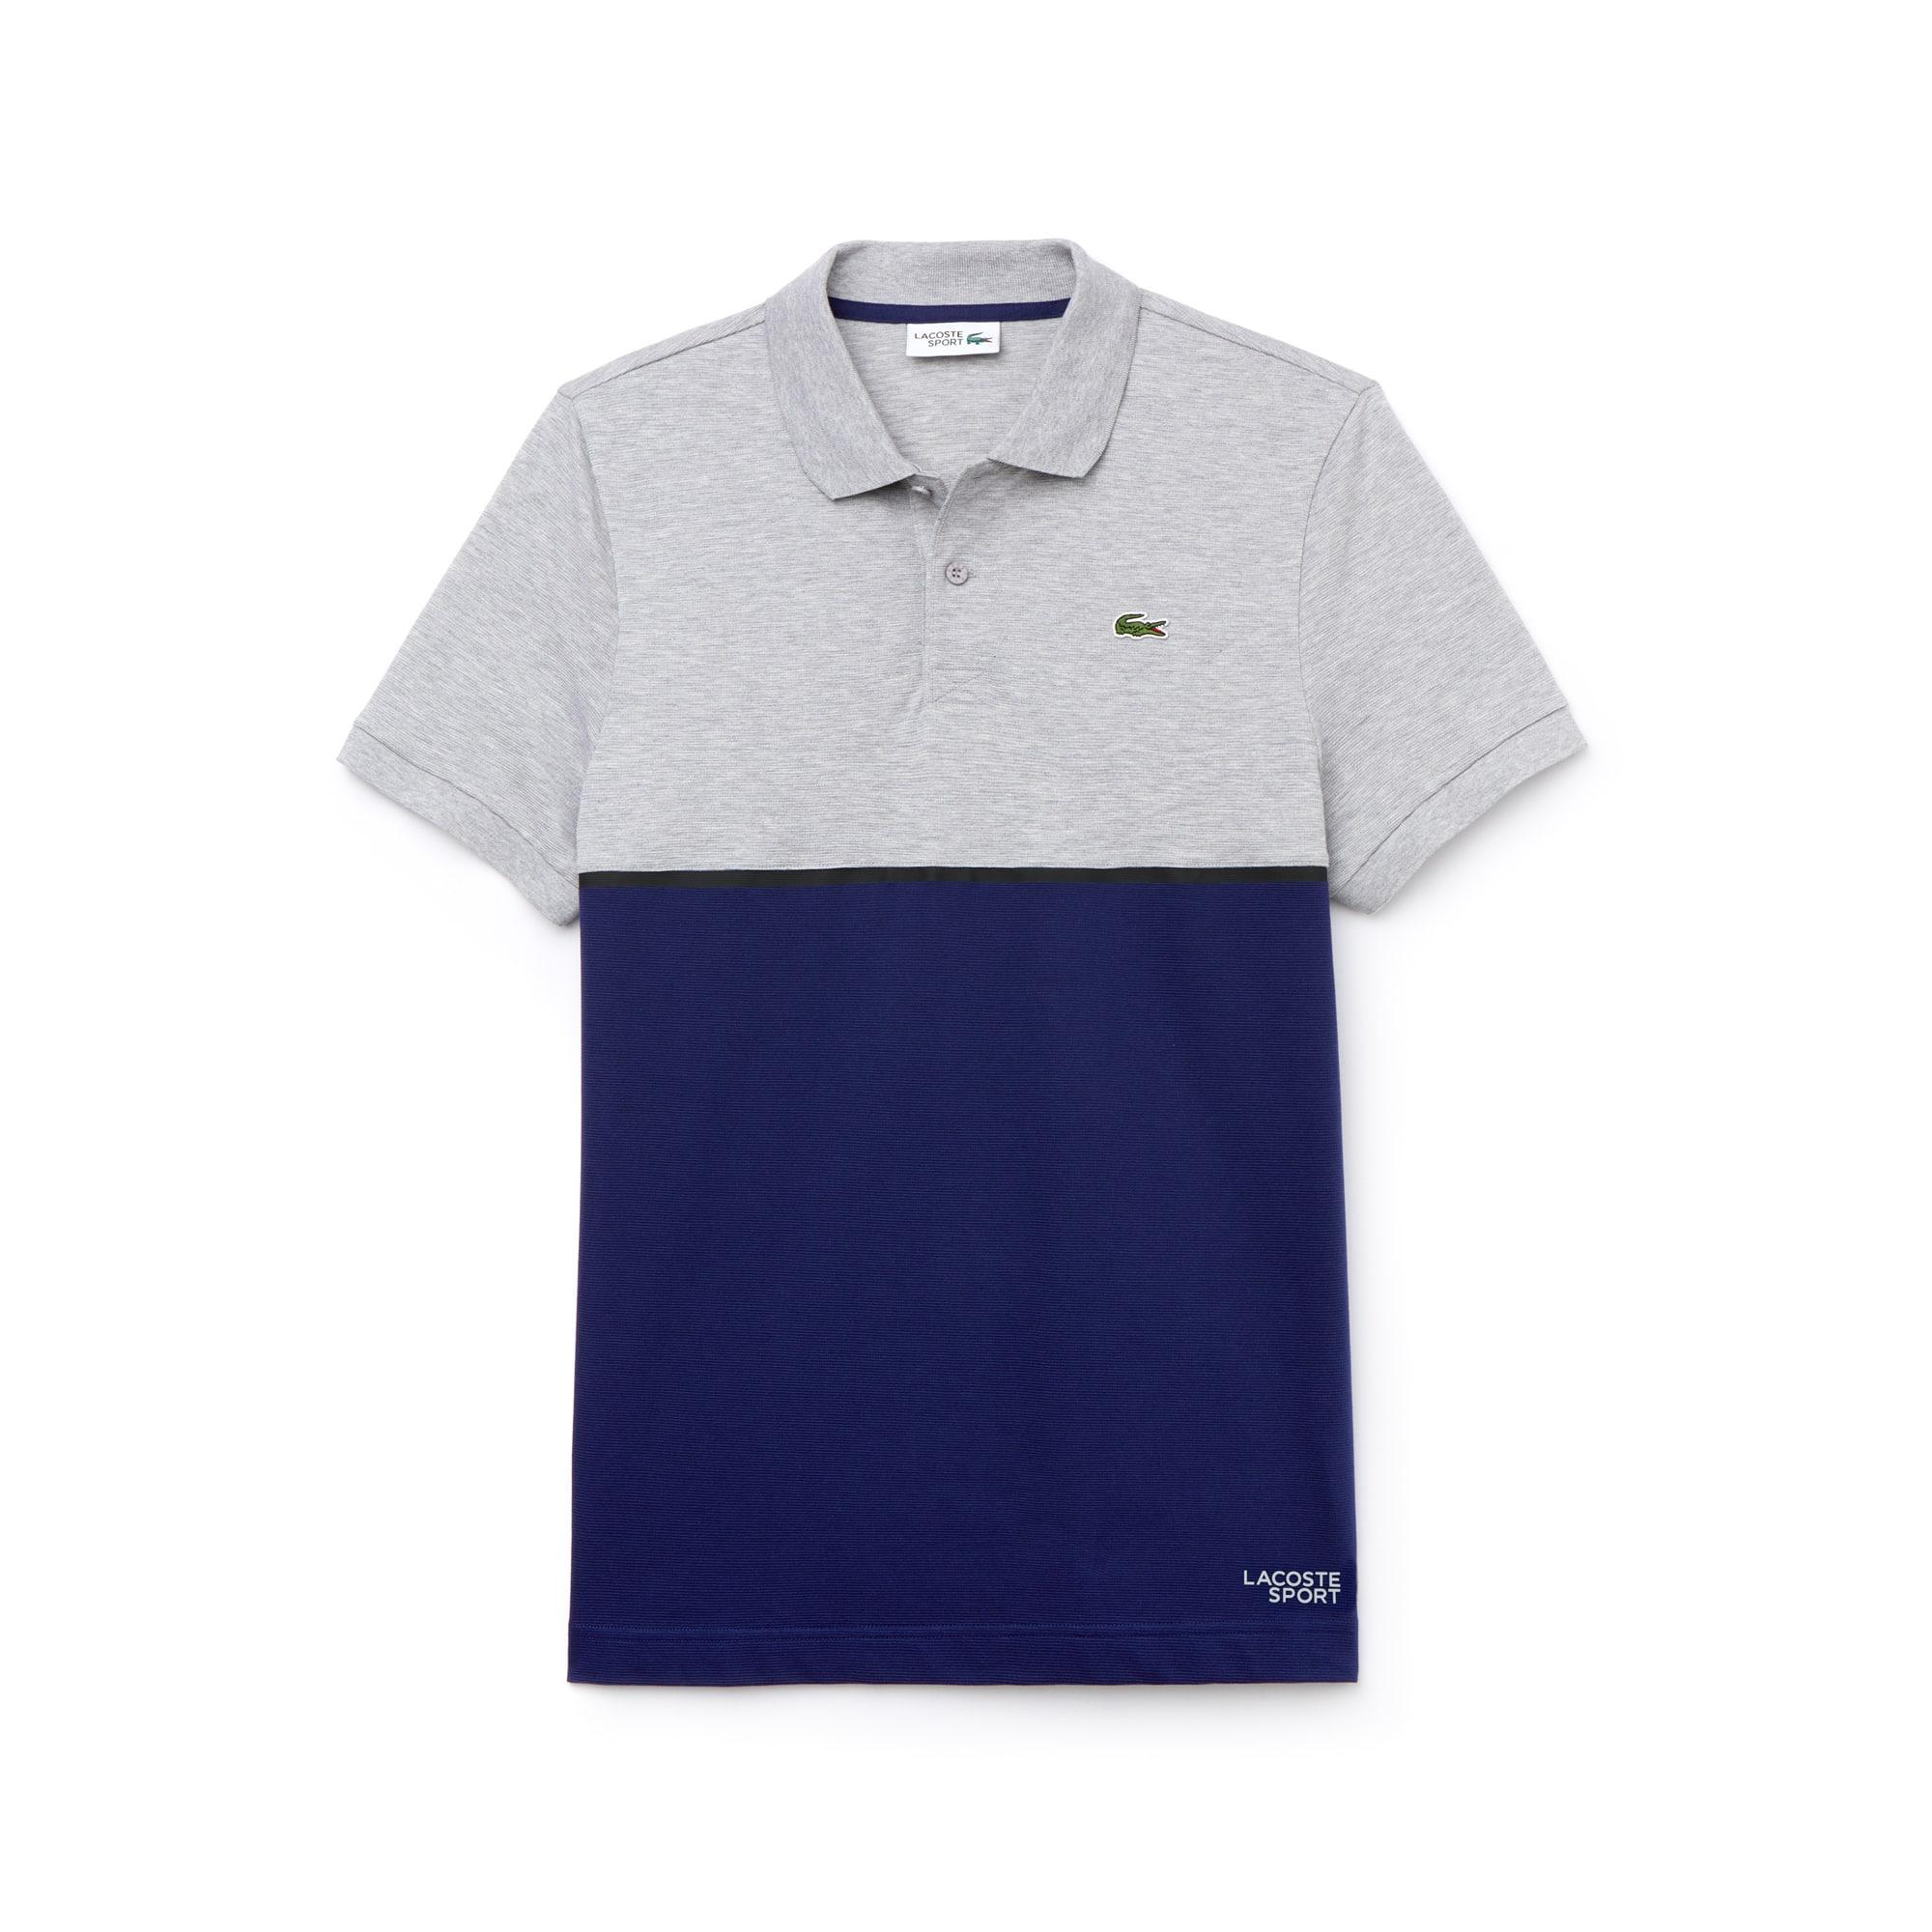 Men's SPORT Ultra-Light Cotton Tennis Polo